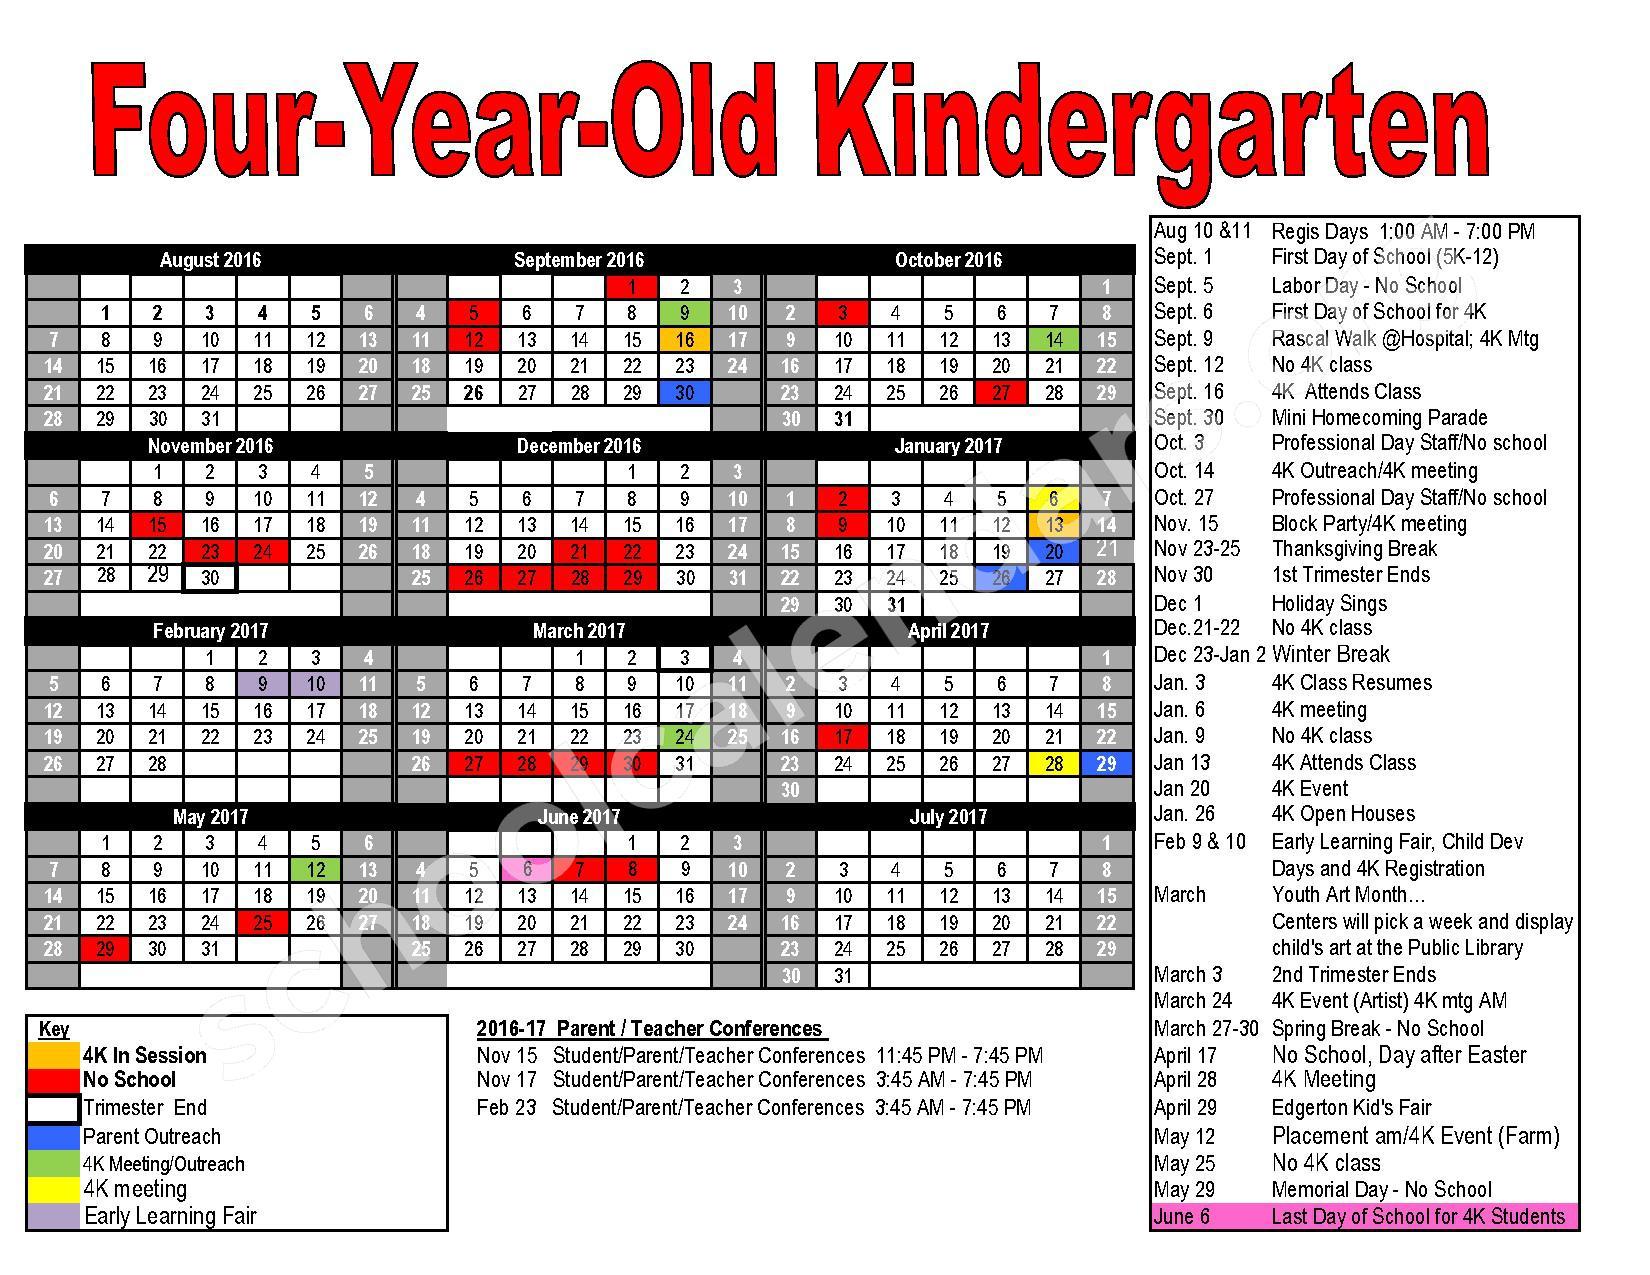 2016 - 2017 Kindergarten District Calendar – Edgerton School District – page 1